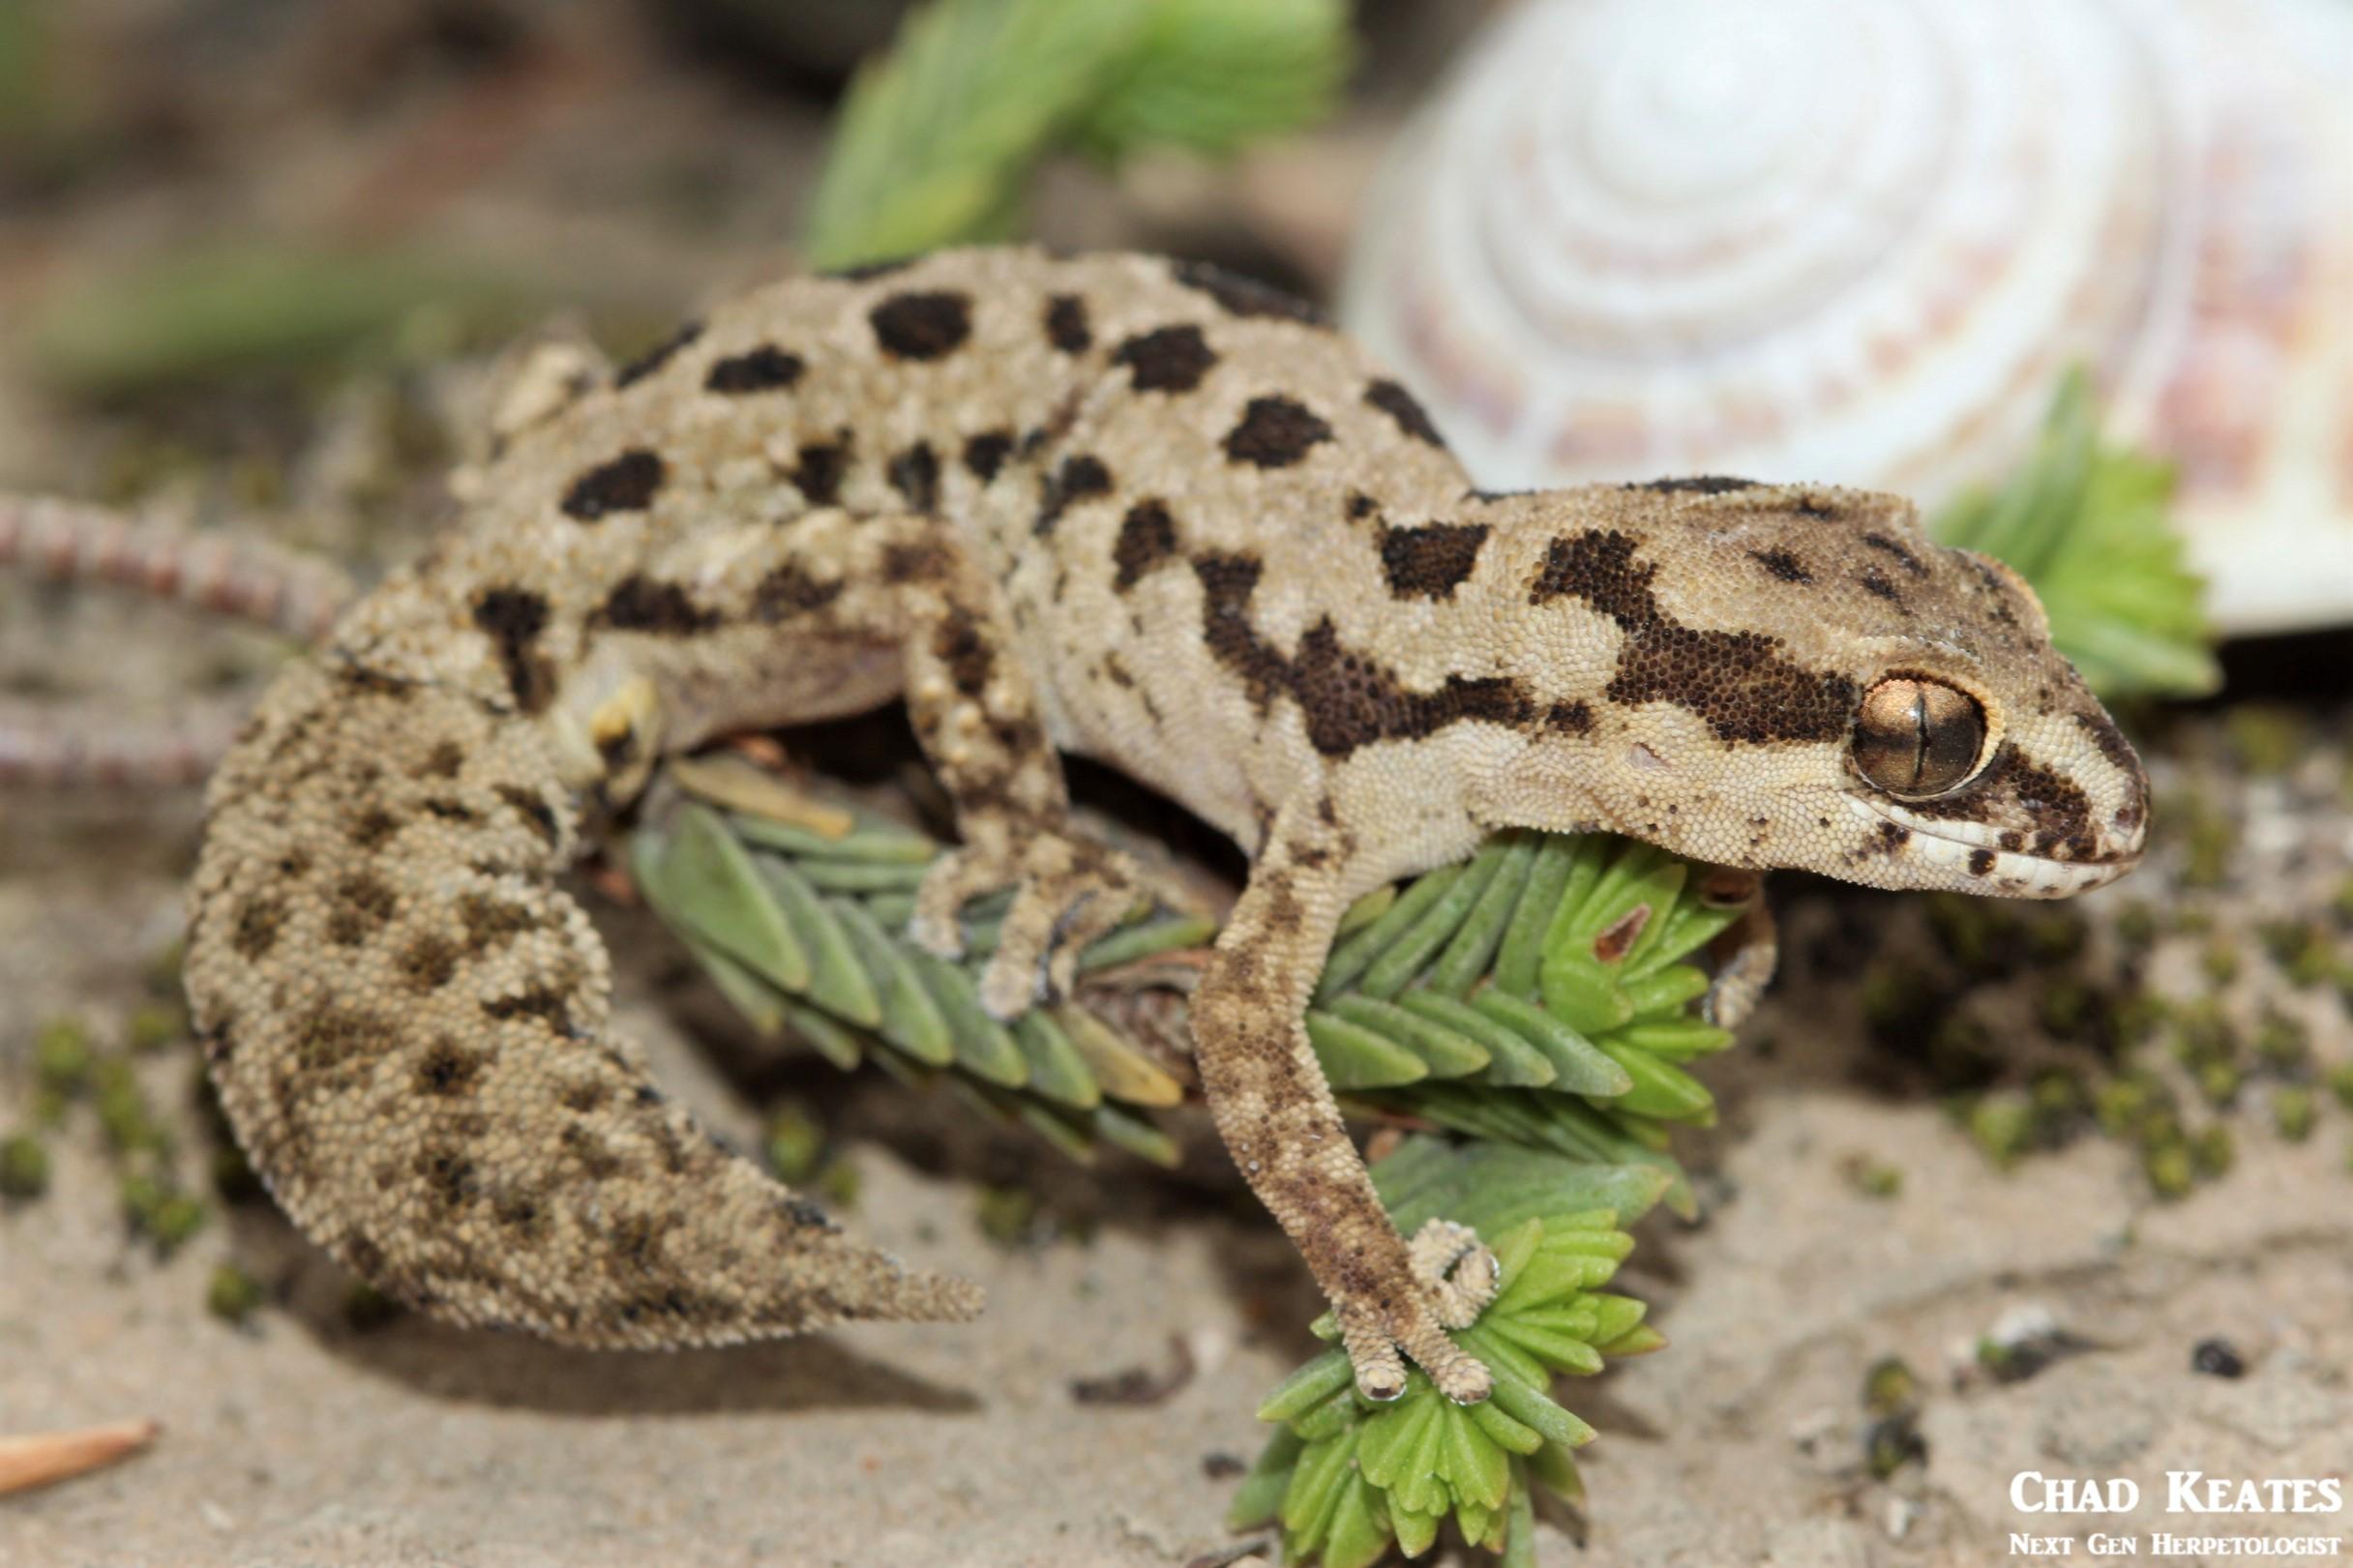 Pachydactylus_maculatus_Spotted_Gecko_Chad_Keates (2)